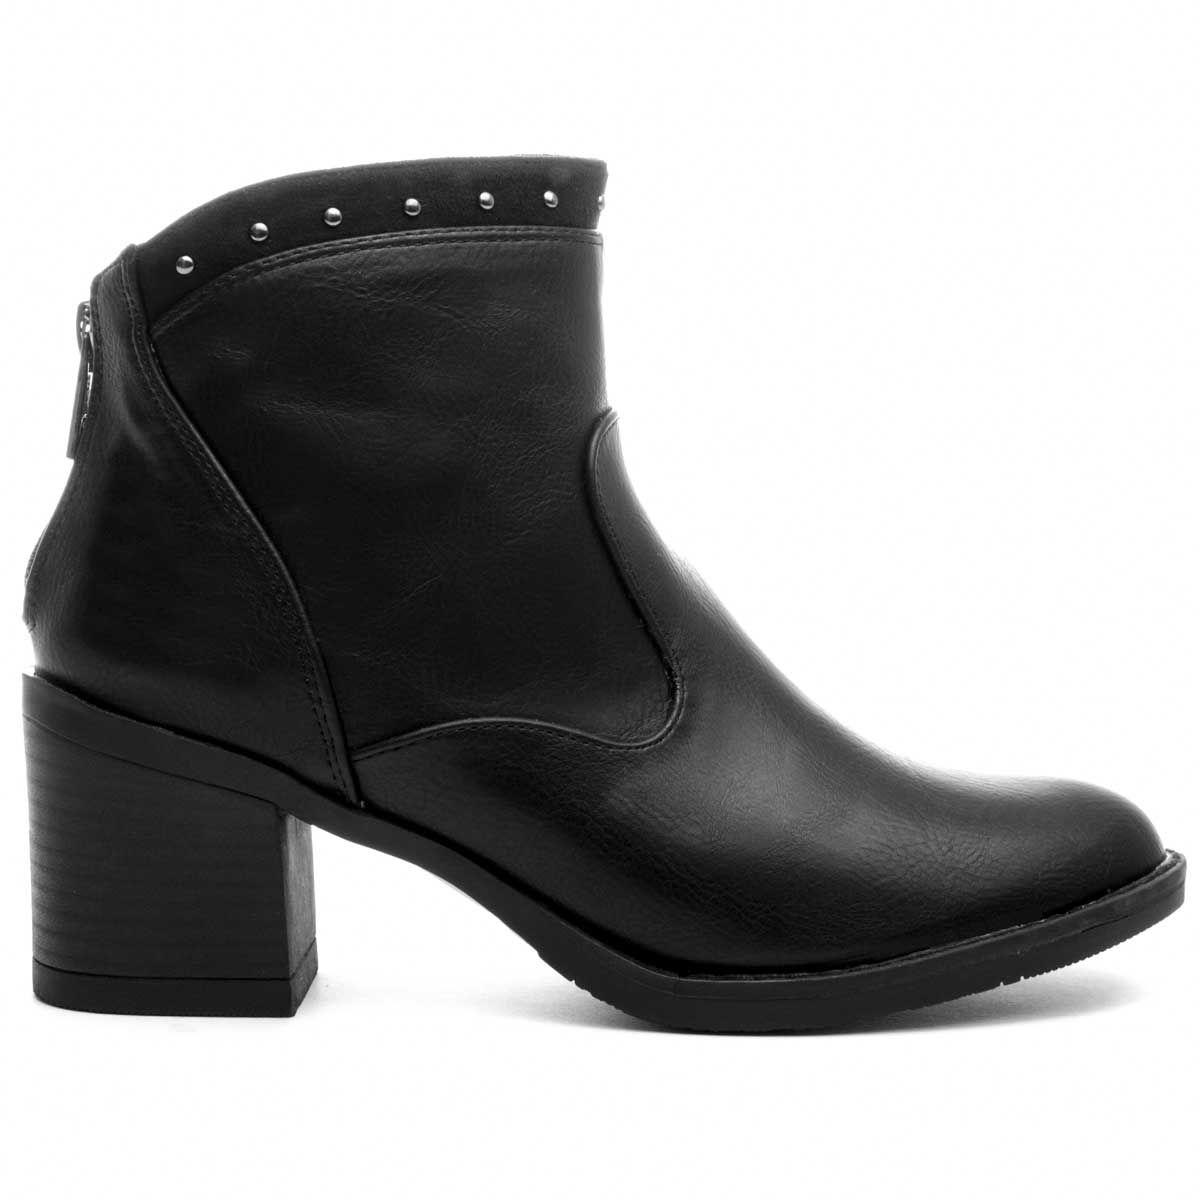 Montevita Heeled Ankle Boot in Black